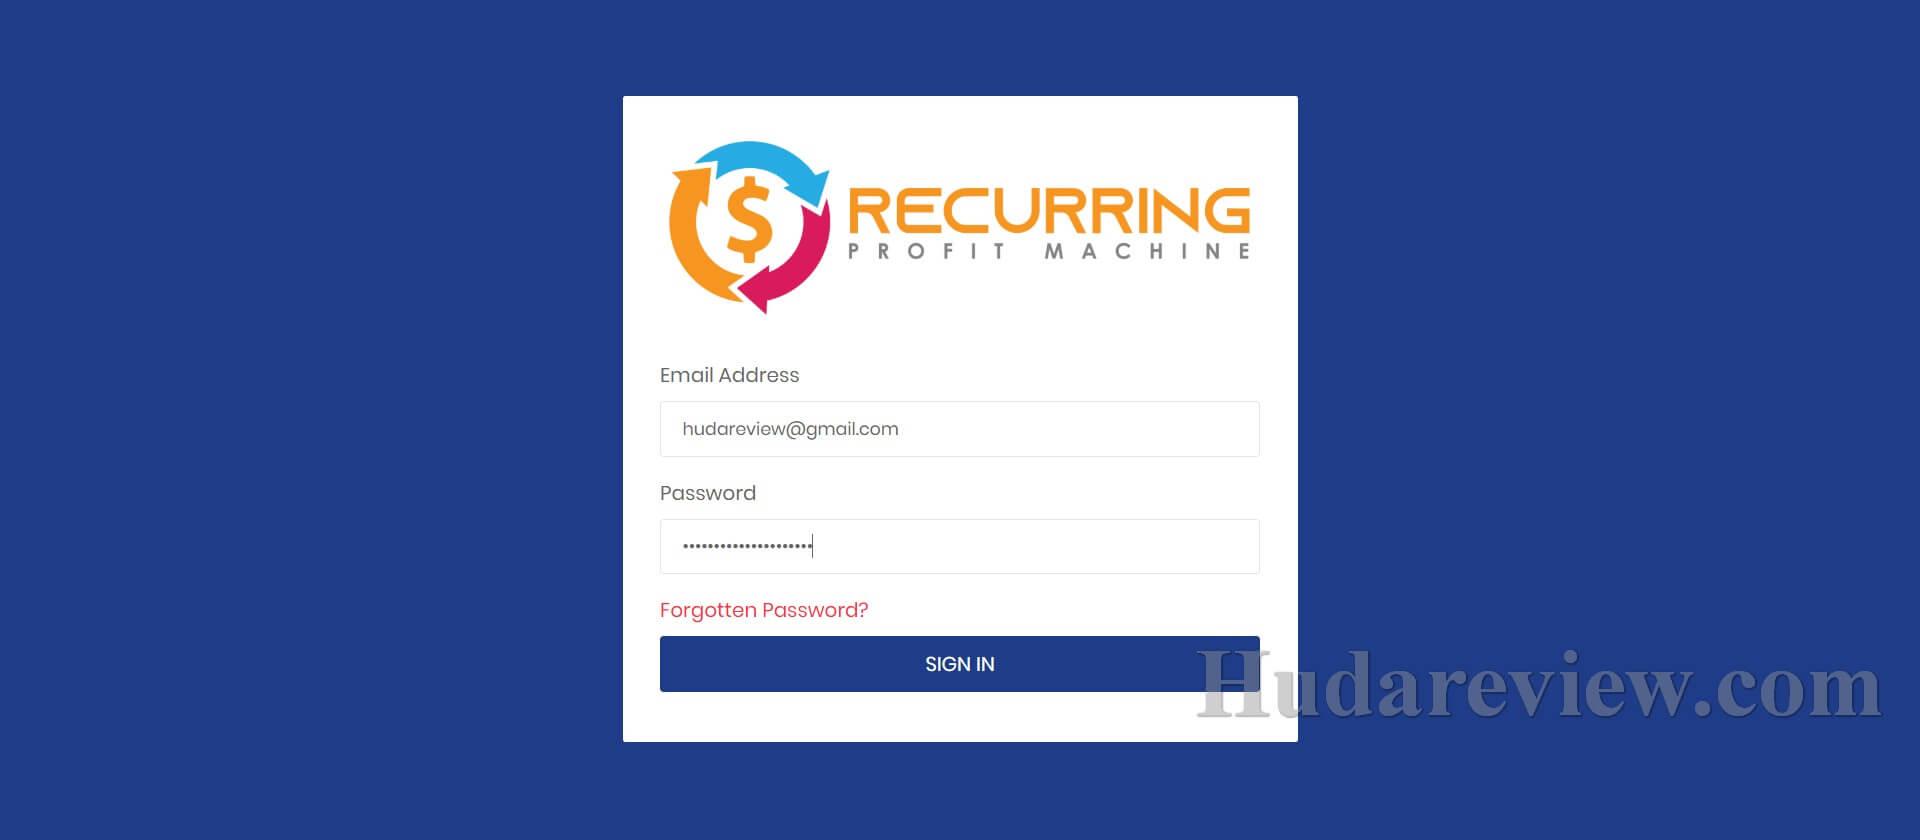 Recurring-Profit-Machine-Review-1